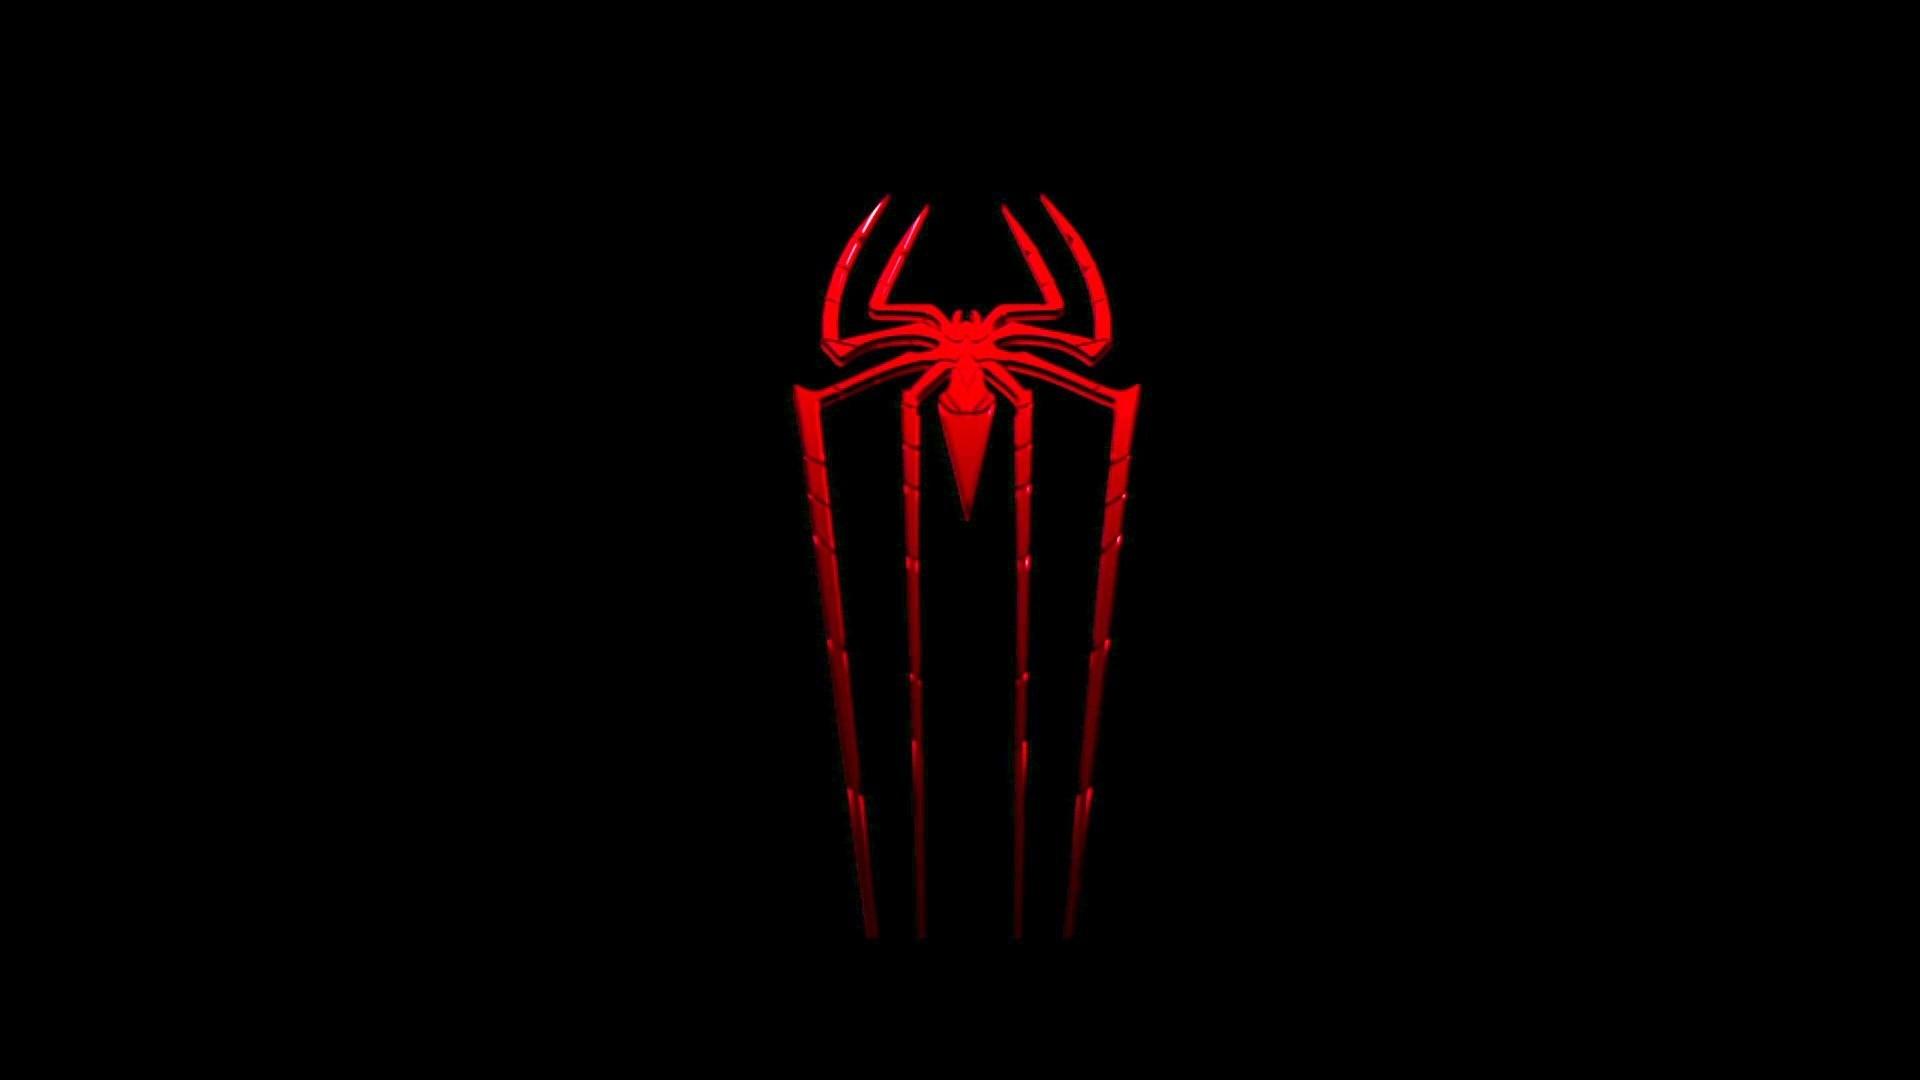 Spiderman Logo Wallpaper High Definition : Other Wallpaper .